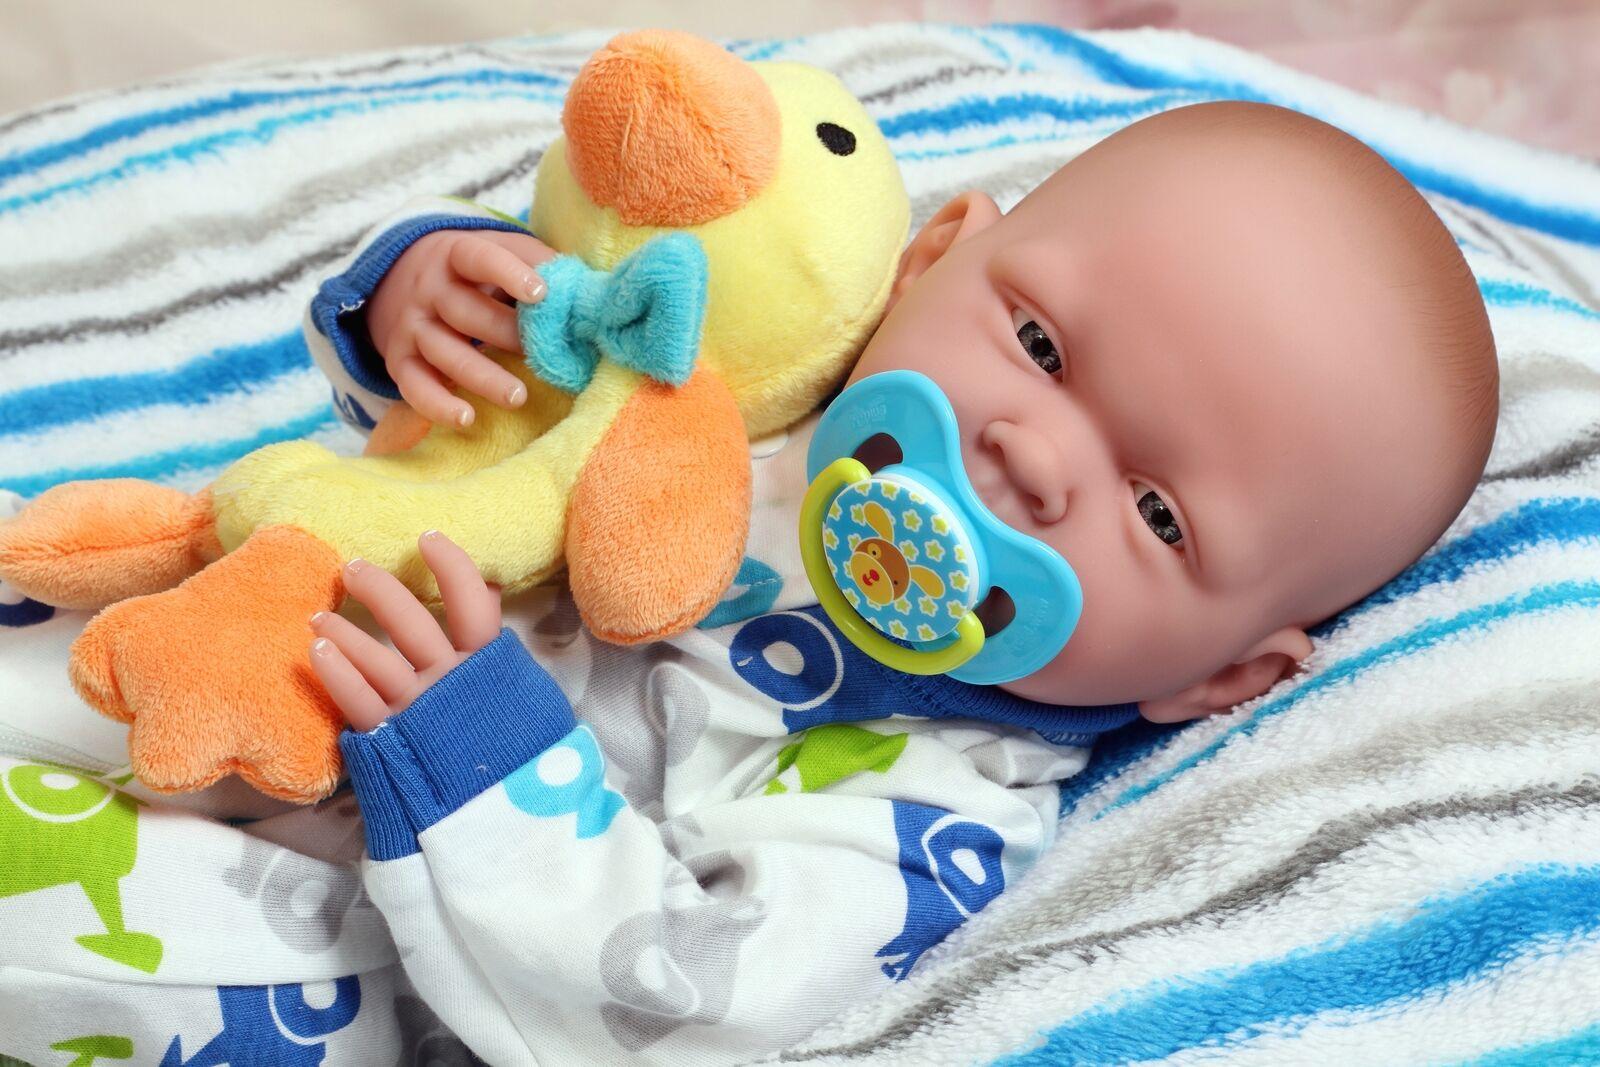 Baby Boy Doll Realistic 15  Real Alive Soft Vinyl Washable Preemie Life Like